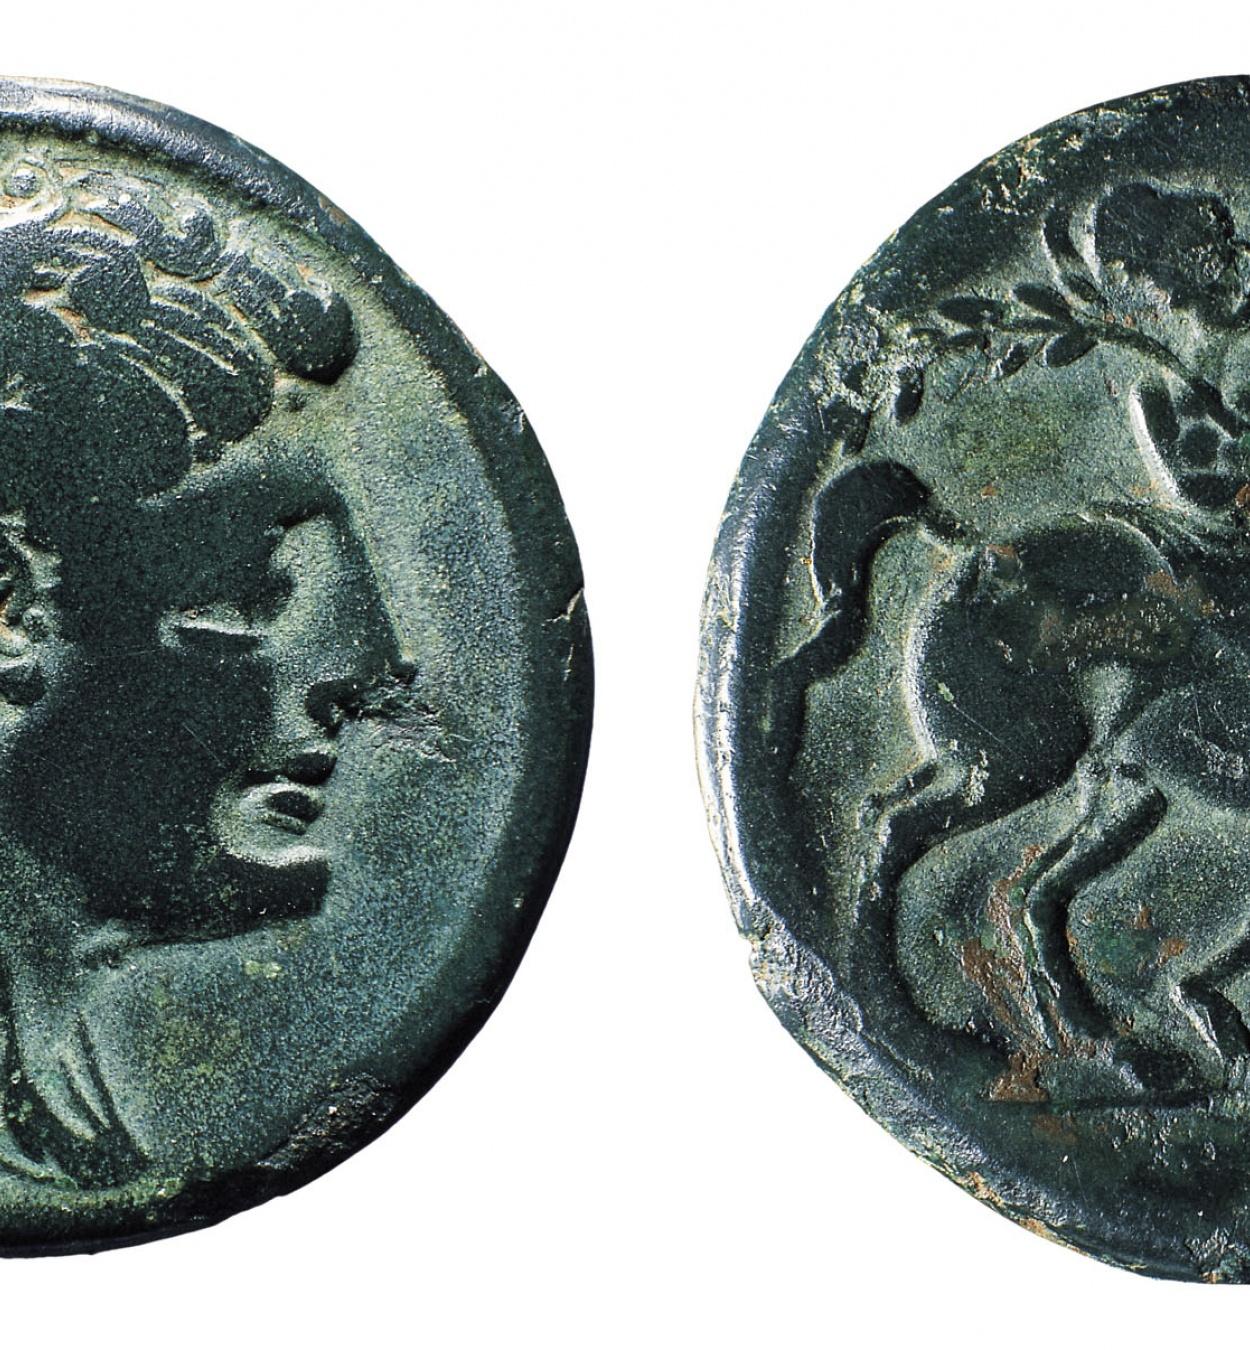 Kese - Unitat - Segona meitat del segle II aC